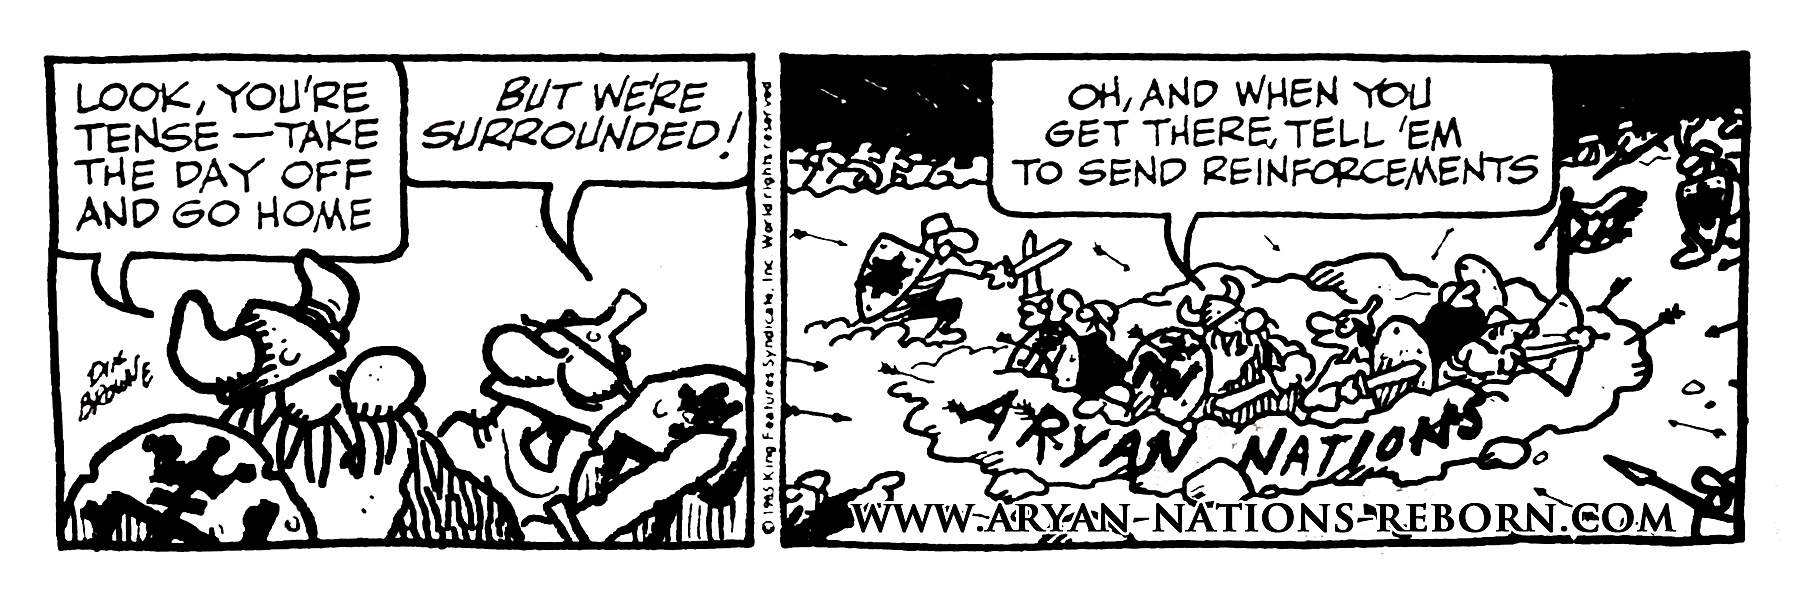 1985 Aryan Nations Comic Strip